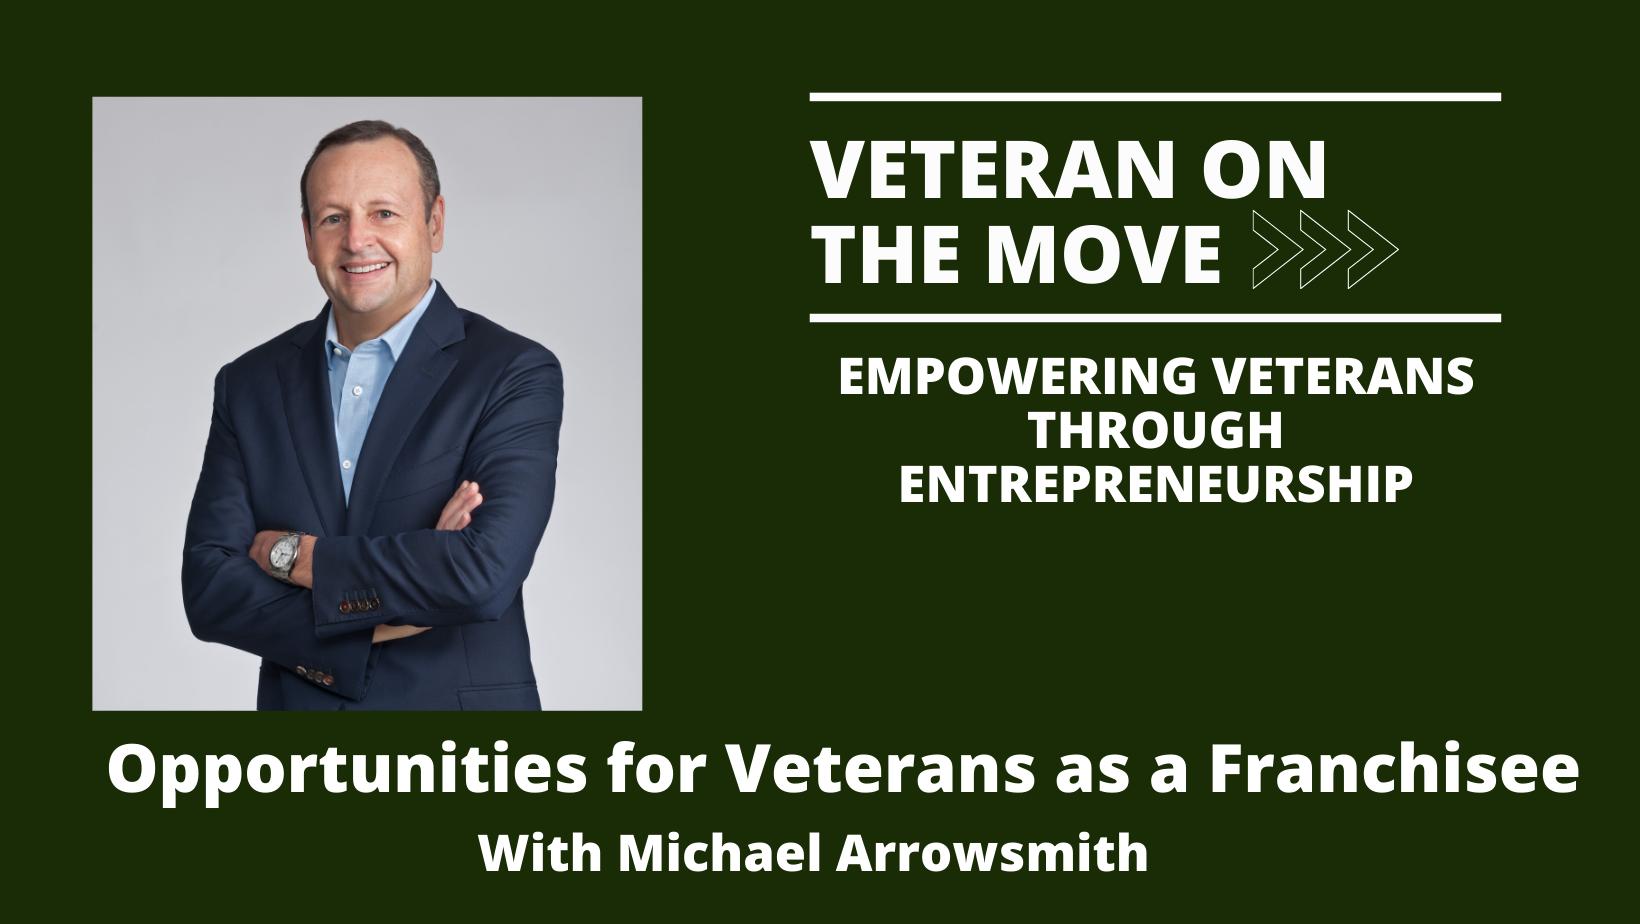 Michael Arrowsmith, Veteran On The Move